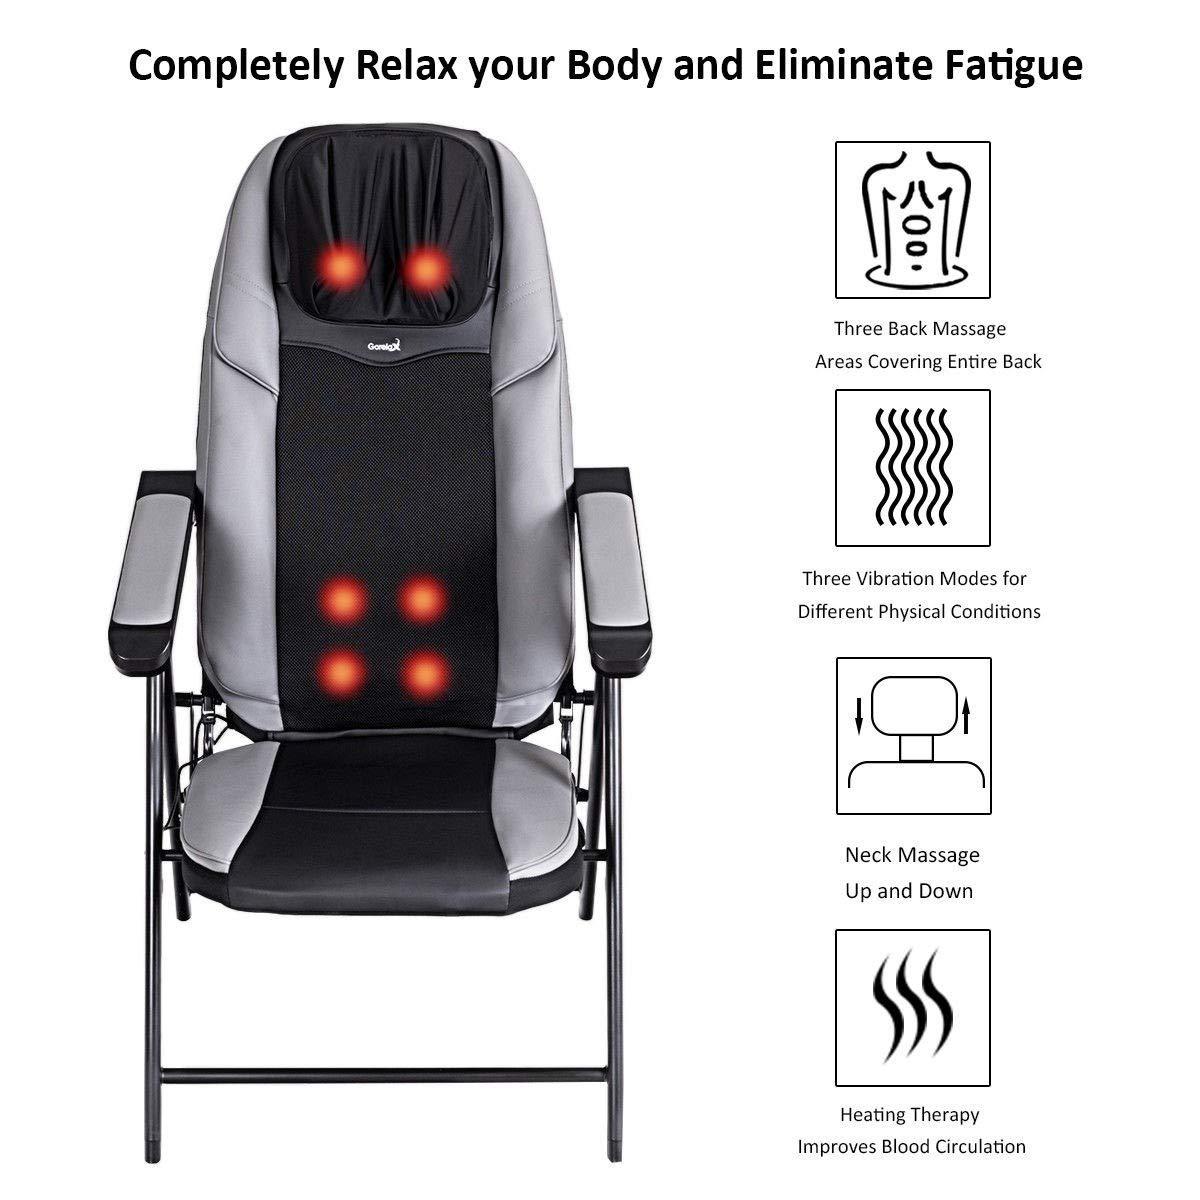 Amazon.com: Silla de masaje Shiatsu plegable y ajustable con ...